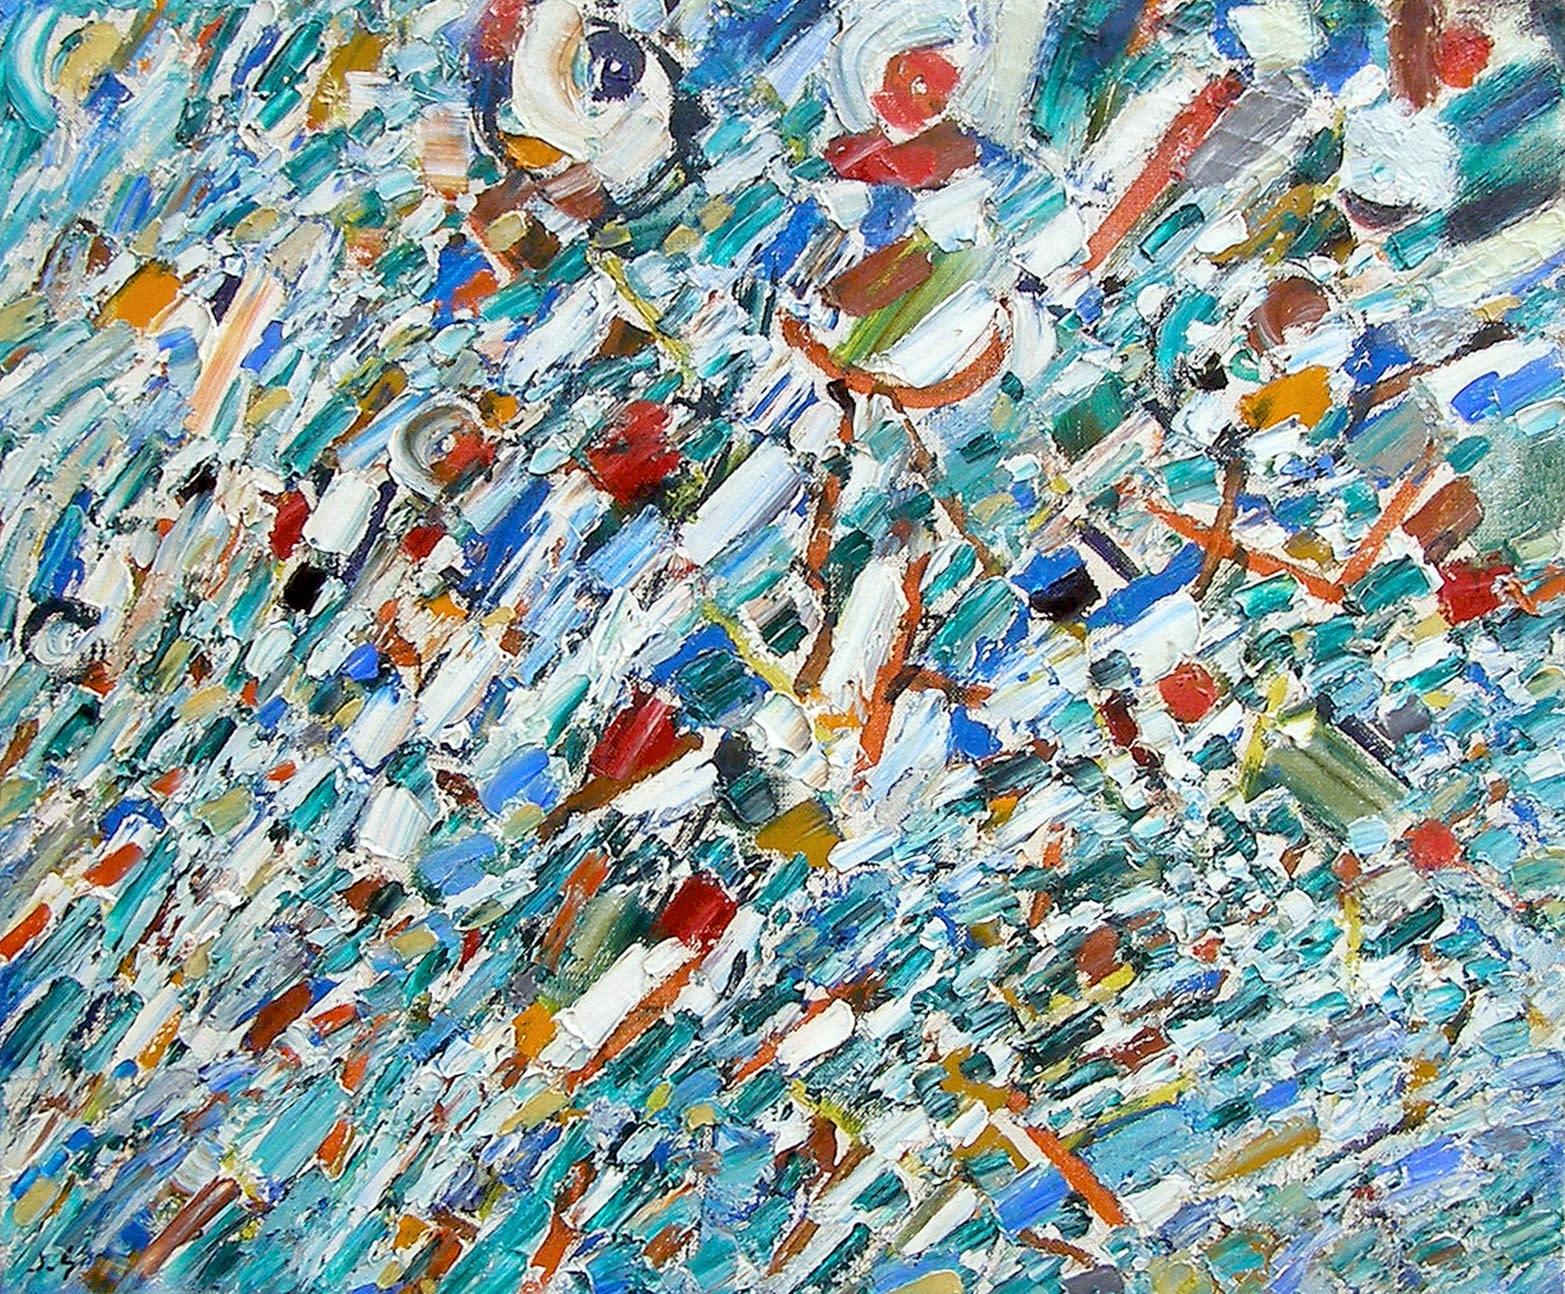 Composition Abstraite, no. 494